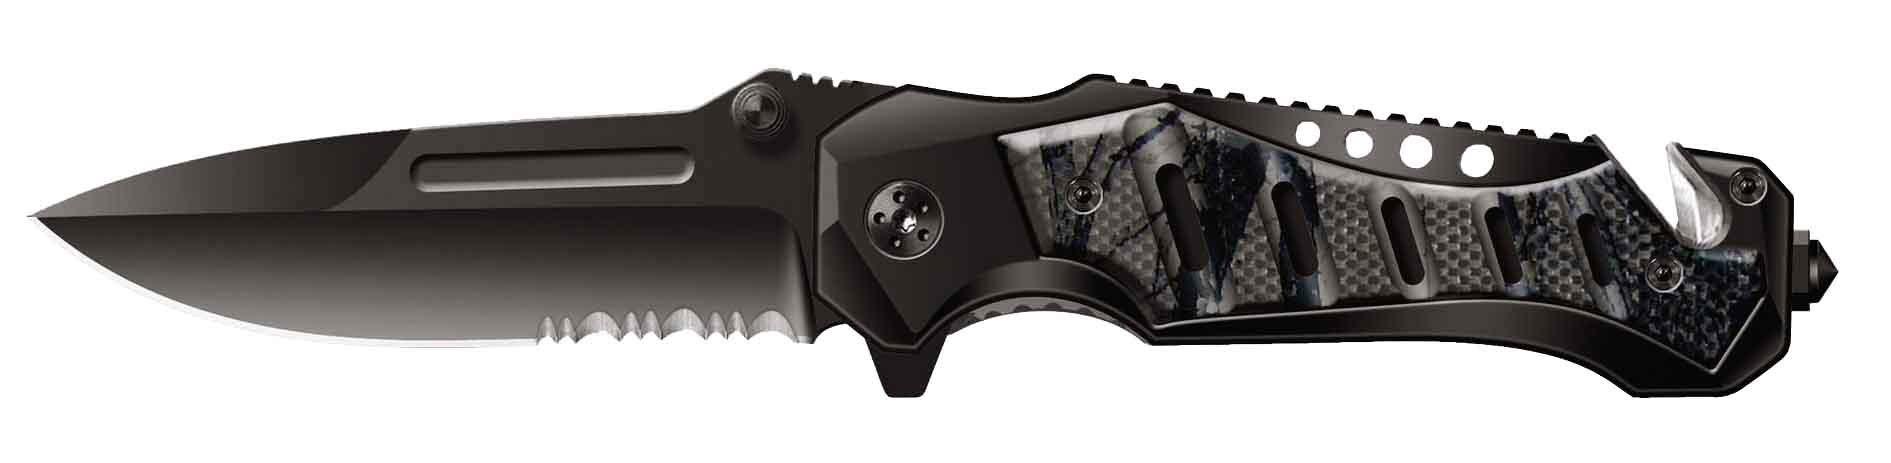 Нож складной Stinger SA-582GY, сталь 420, алюминий